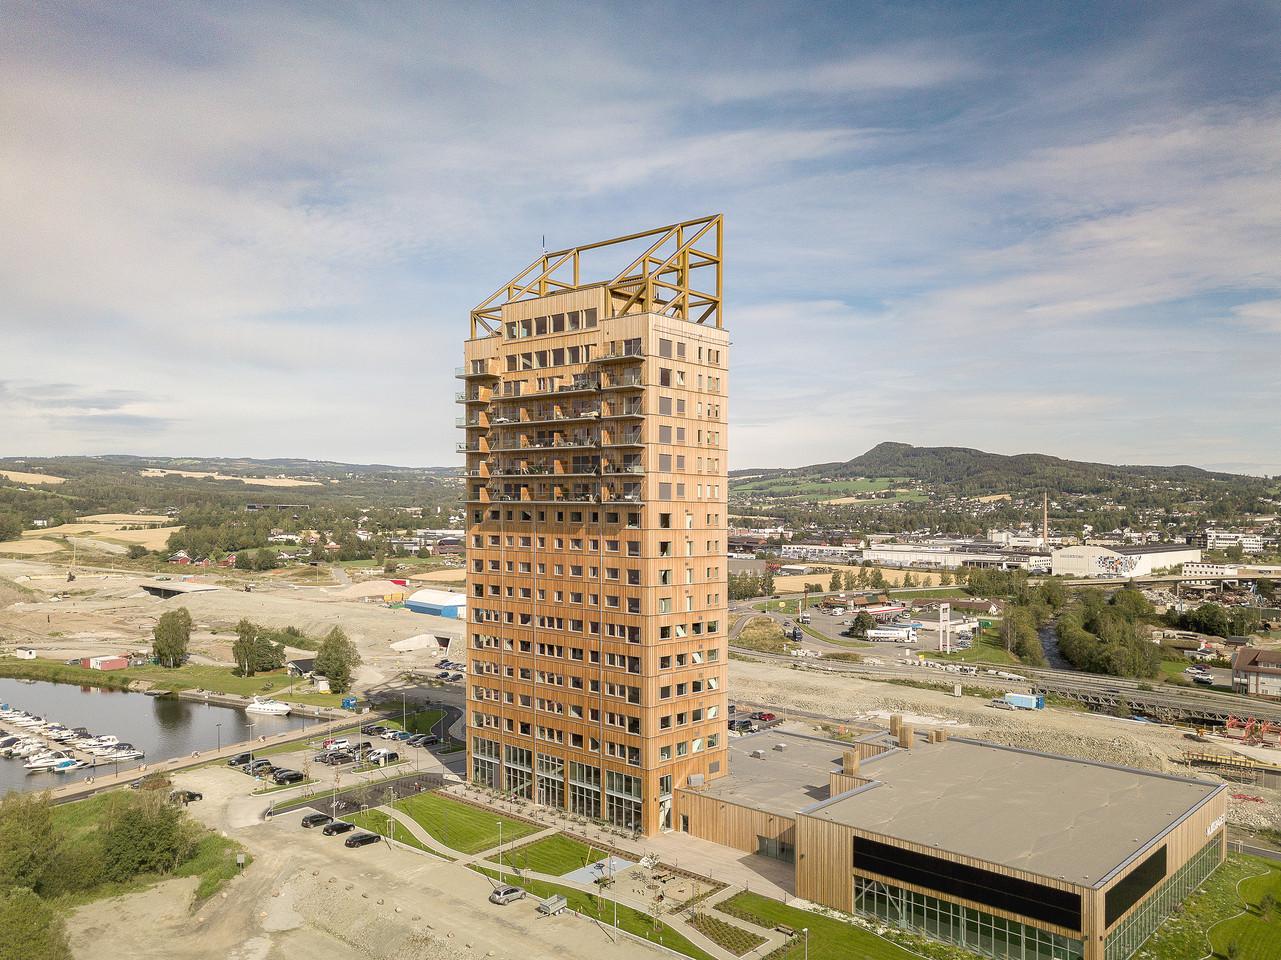 Grattacielo Brummendall Norvegia